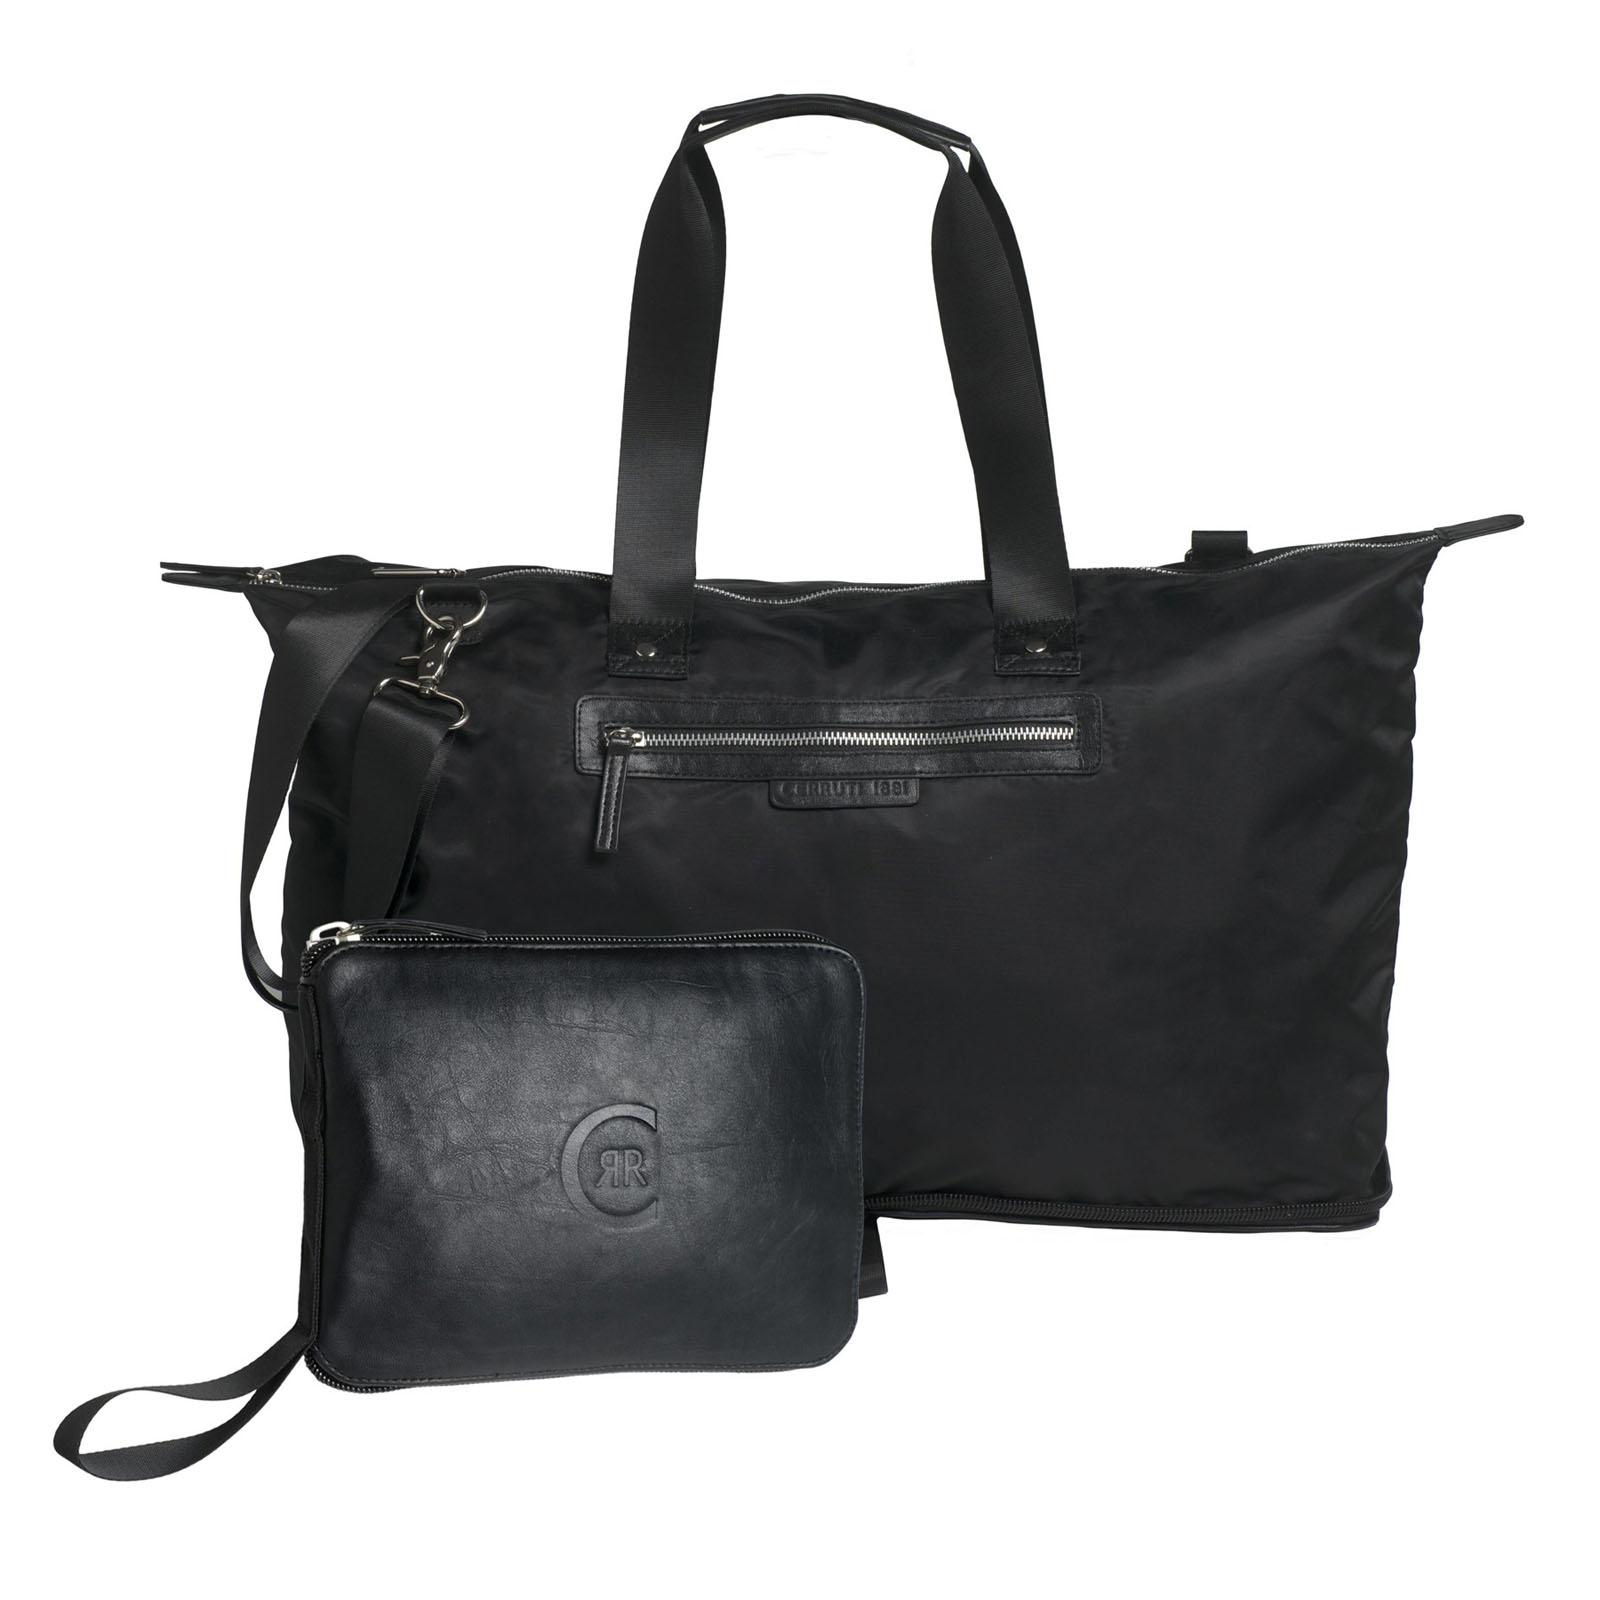 cadeau dentreprise sac voyage pliable boarding le sac voyage pliable boarding sacs de voyage. Black Bedroom Furniture Sets. Home Design Ideas